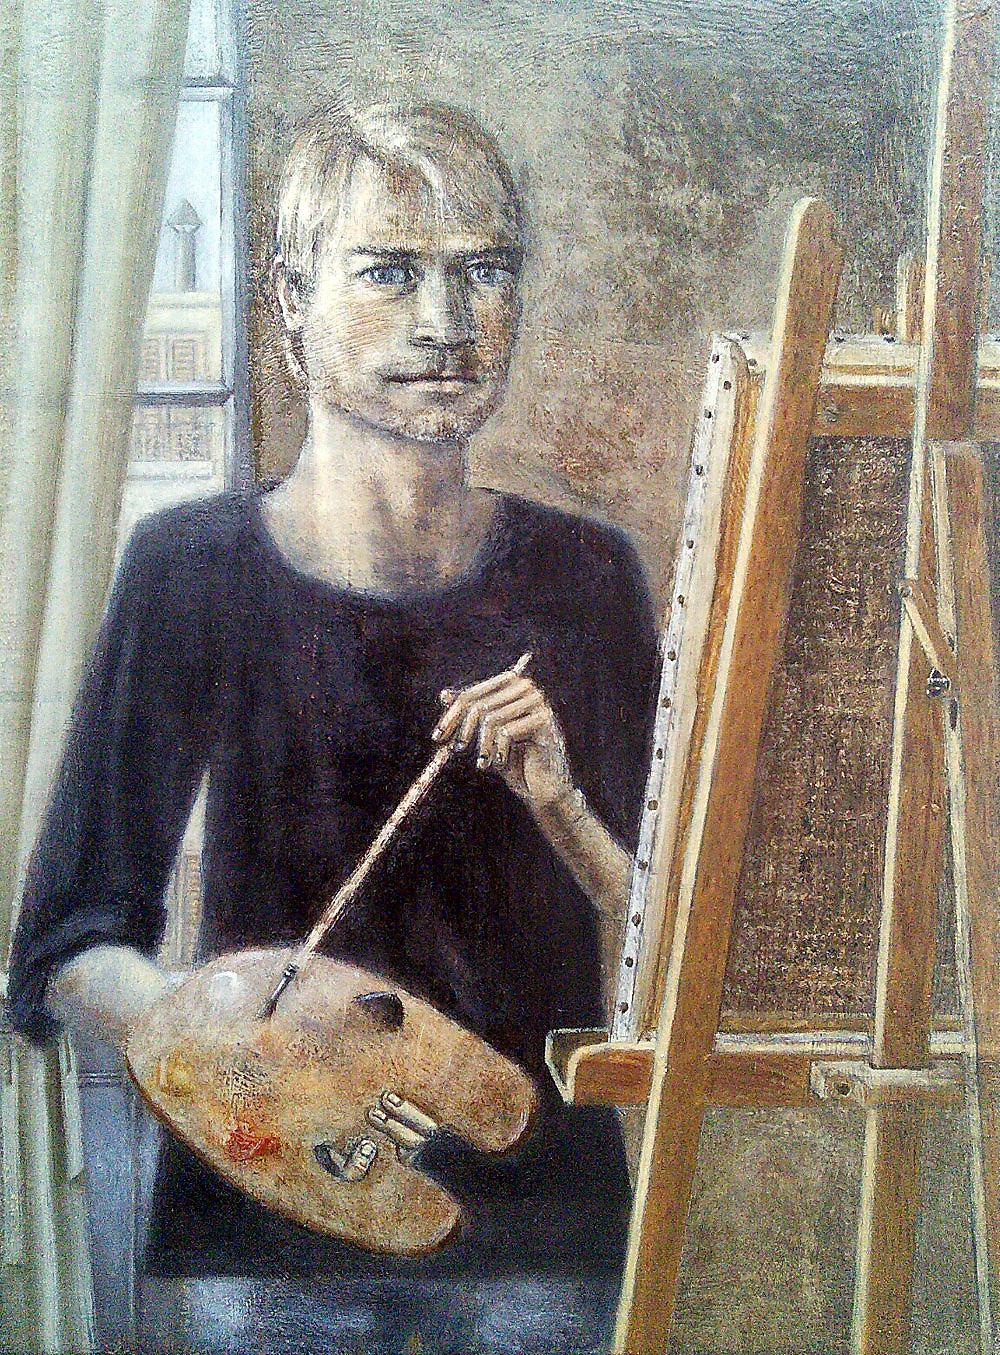 """Self Portrait in Autumn, 2016, oil on linen, 33x24cm"